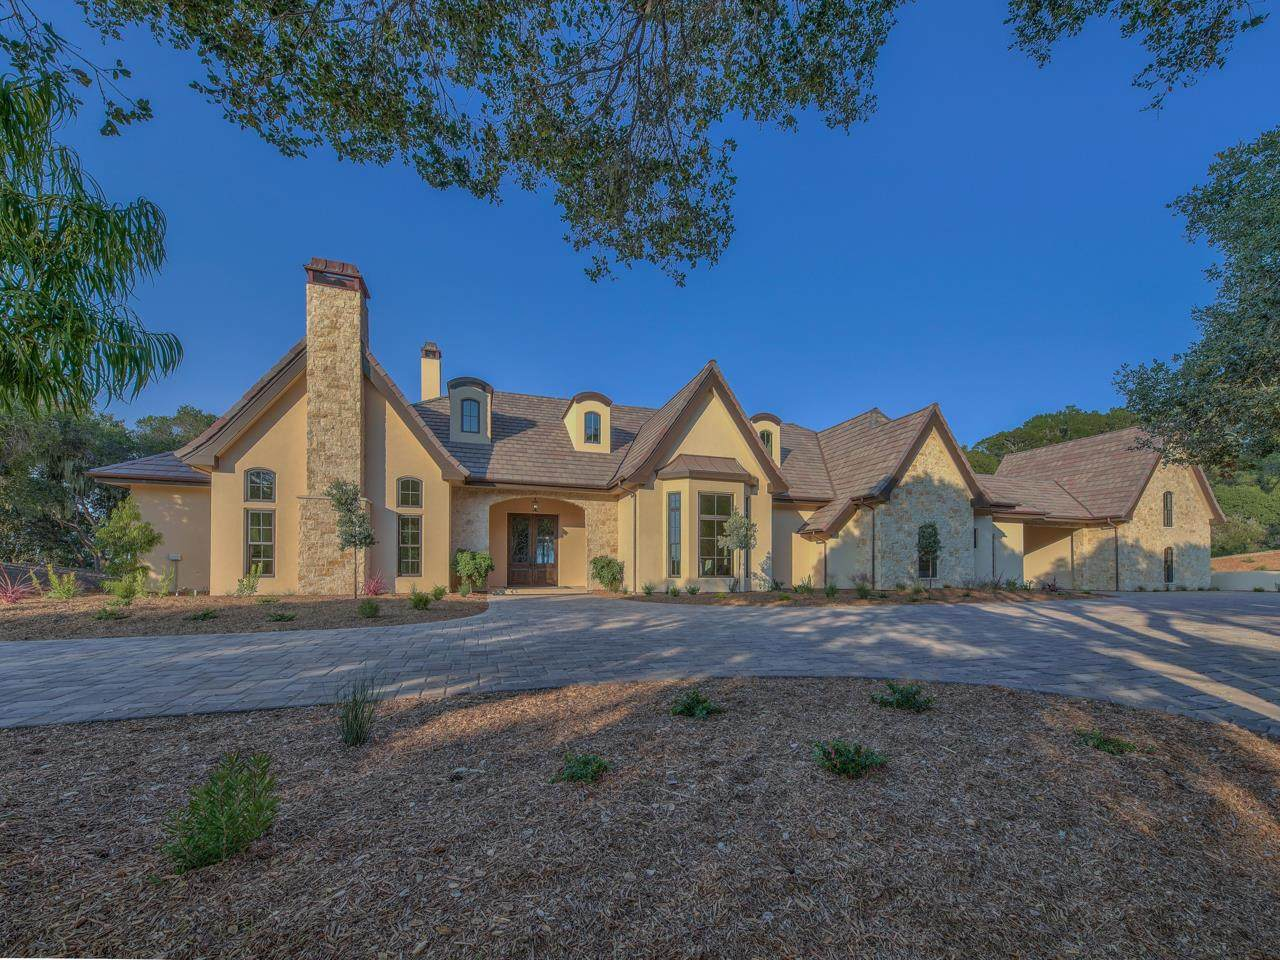 7835 Monterra Oaks Rd - Photo 1